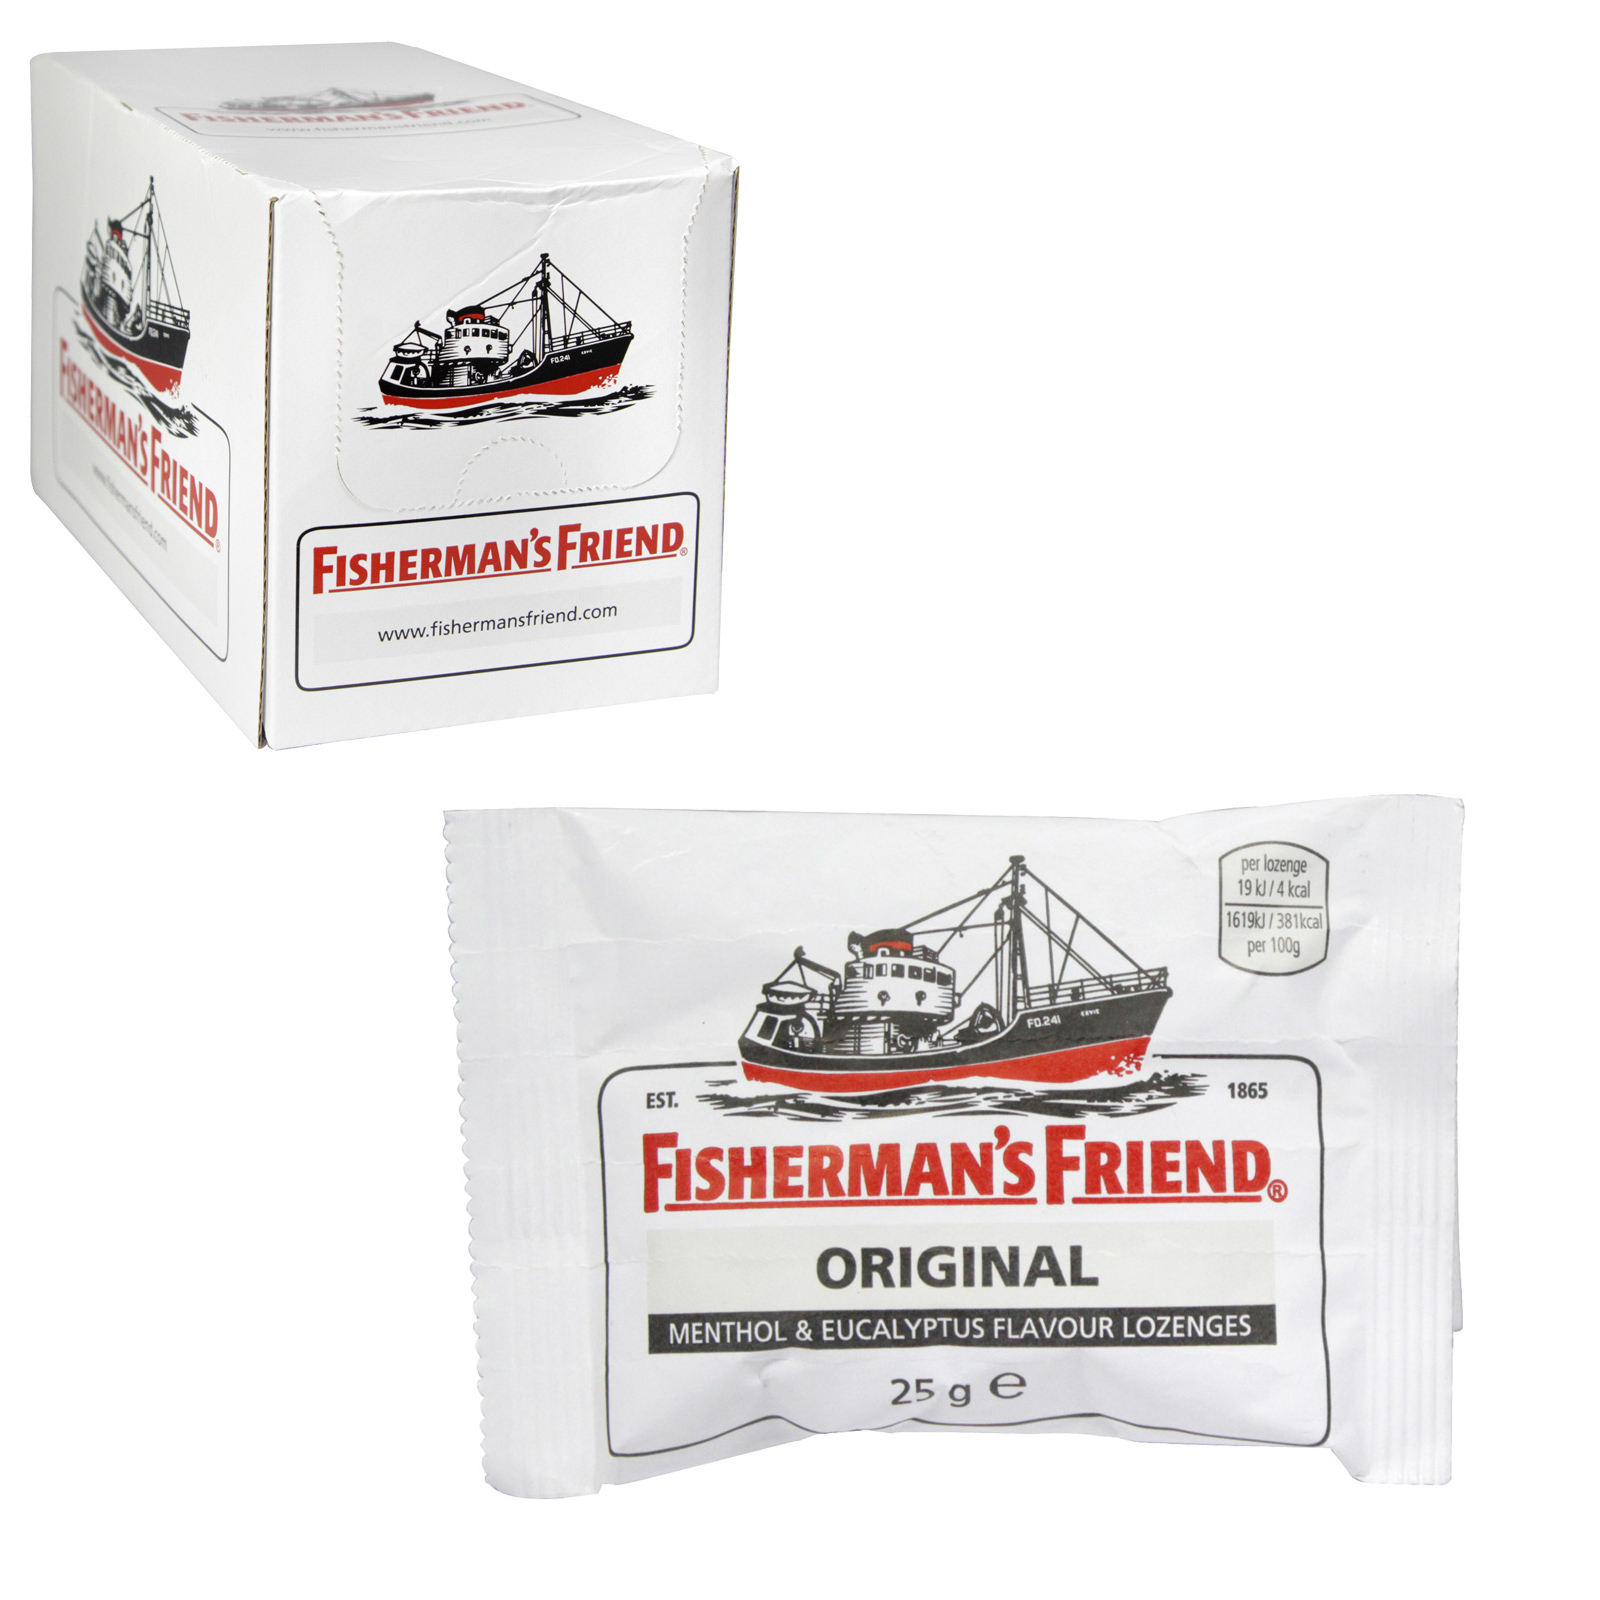 FISHERMANS FRIENDS 25G ORIGINAL XTRA X24